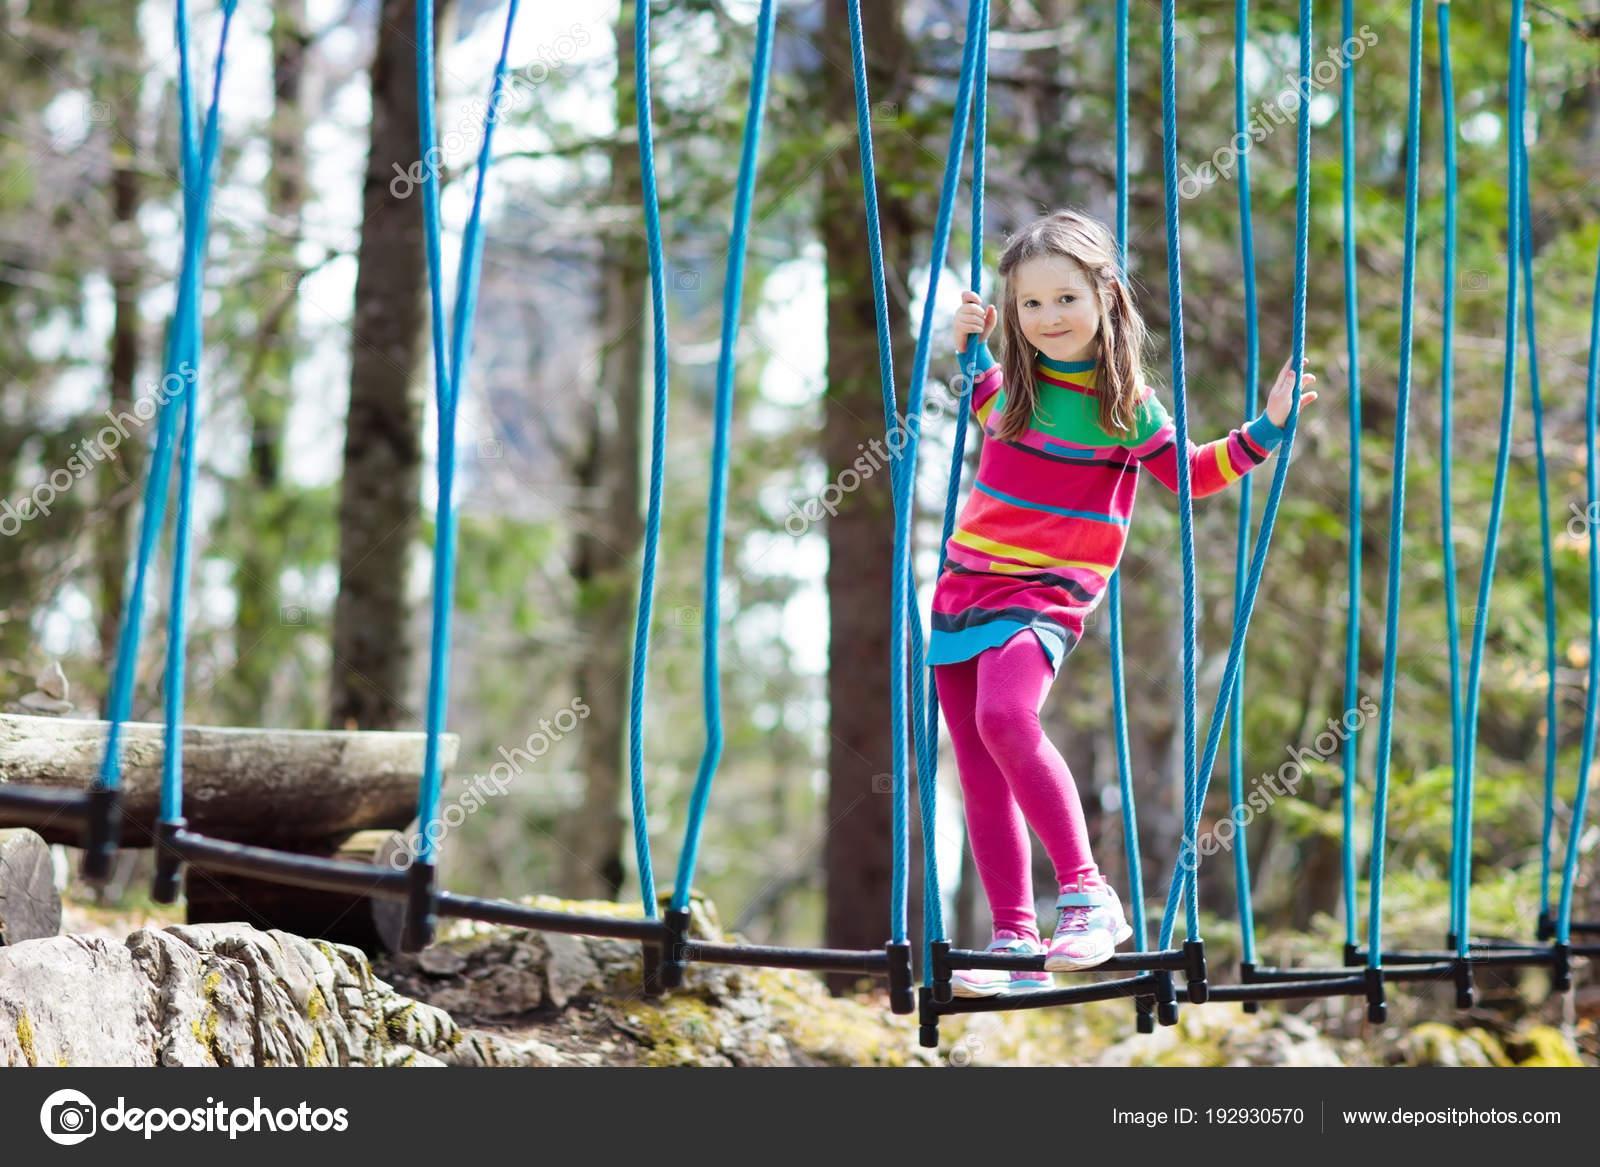 Klettersteig Kinder : Via ferrate bambini kinderklettersteig bergsteigen